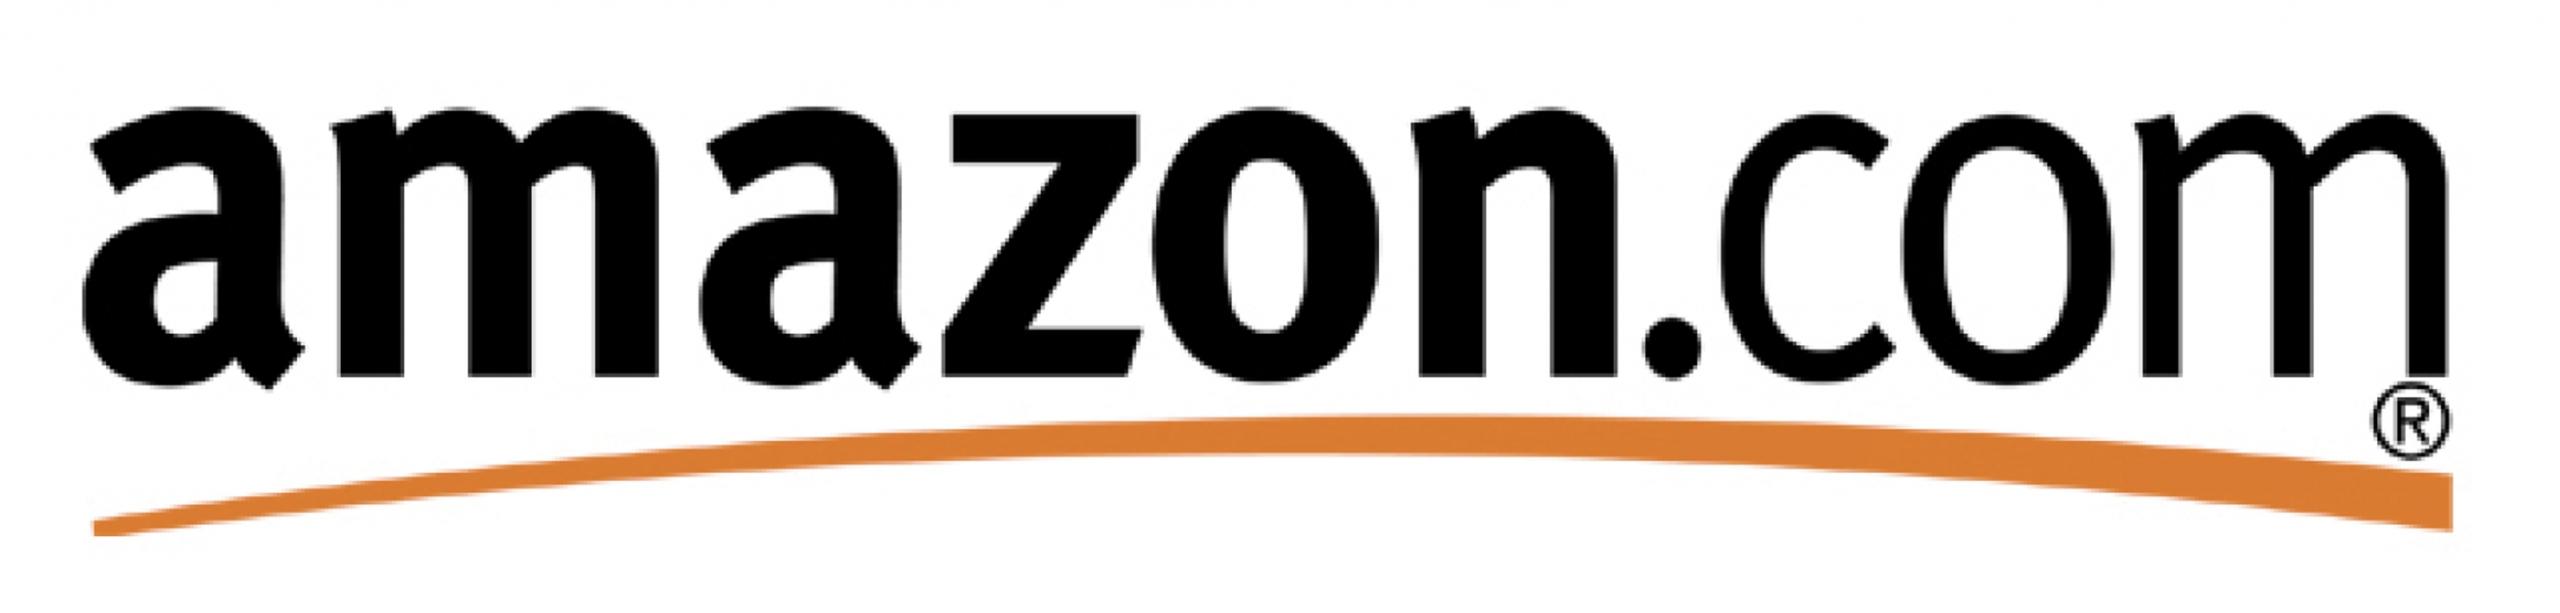 Original Amazon Logo